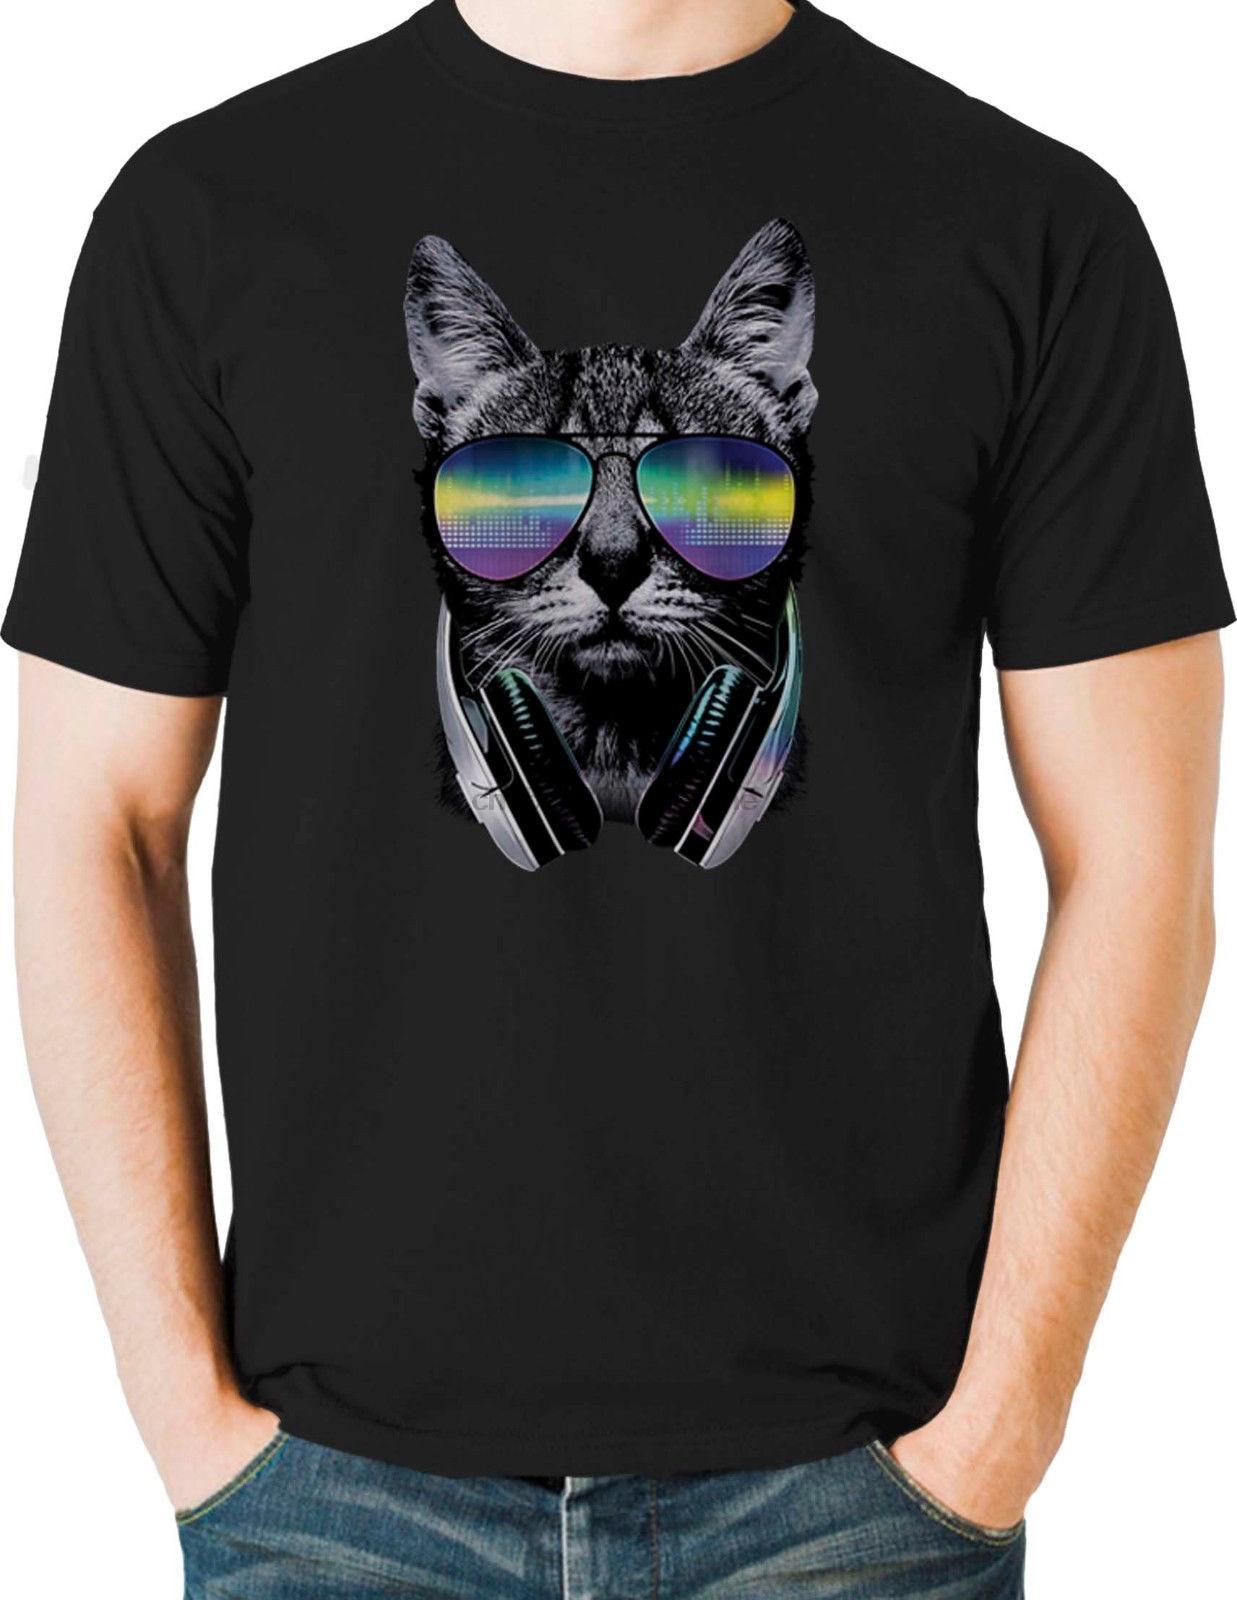 Neon Cat T-Shirt Mens